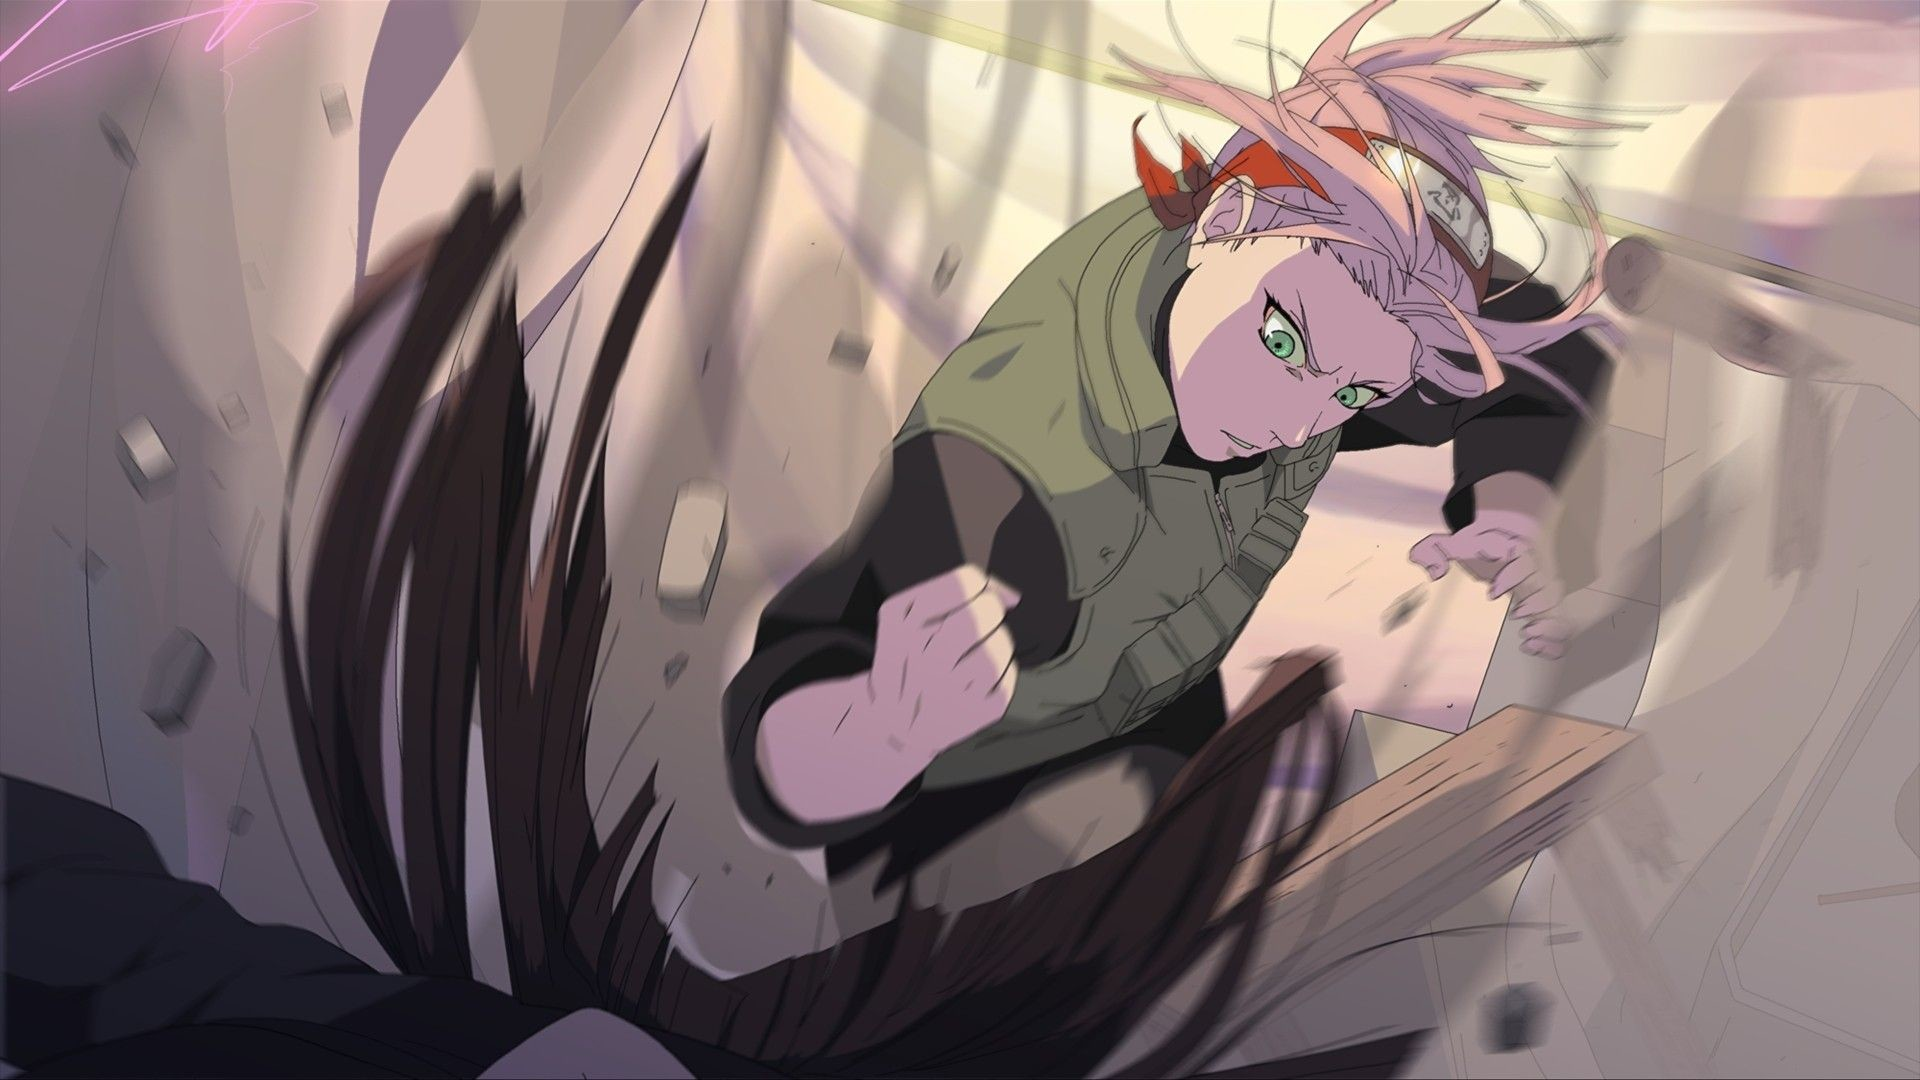 Res: 1920x1080, #pink hair, #green eyes, #Naruto Shippuuden, #anime, #Haruno Sakura, # fighting | Wallpaper No. 7812